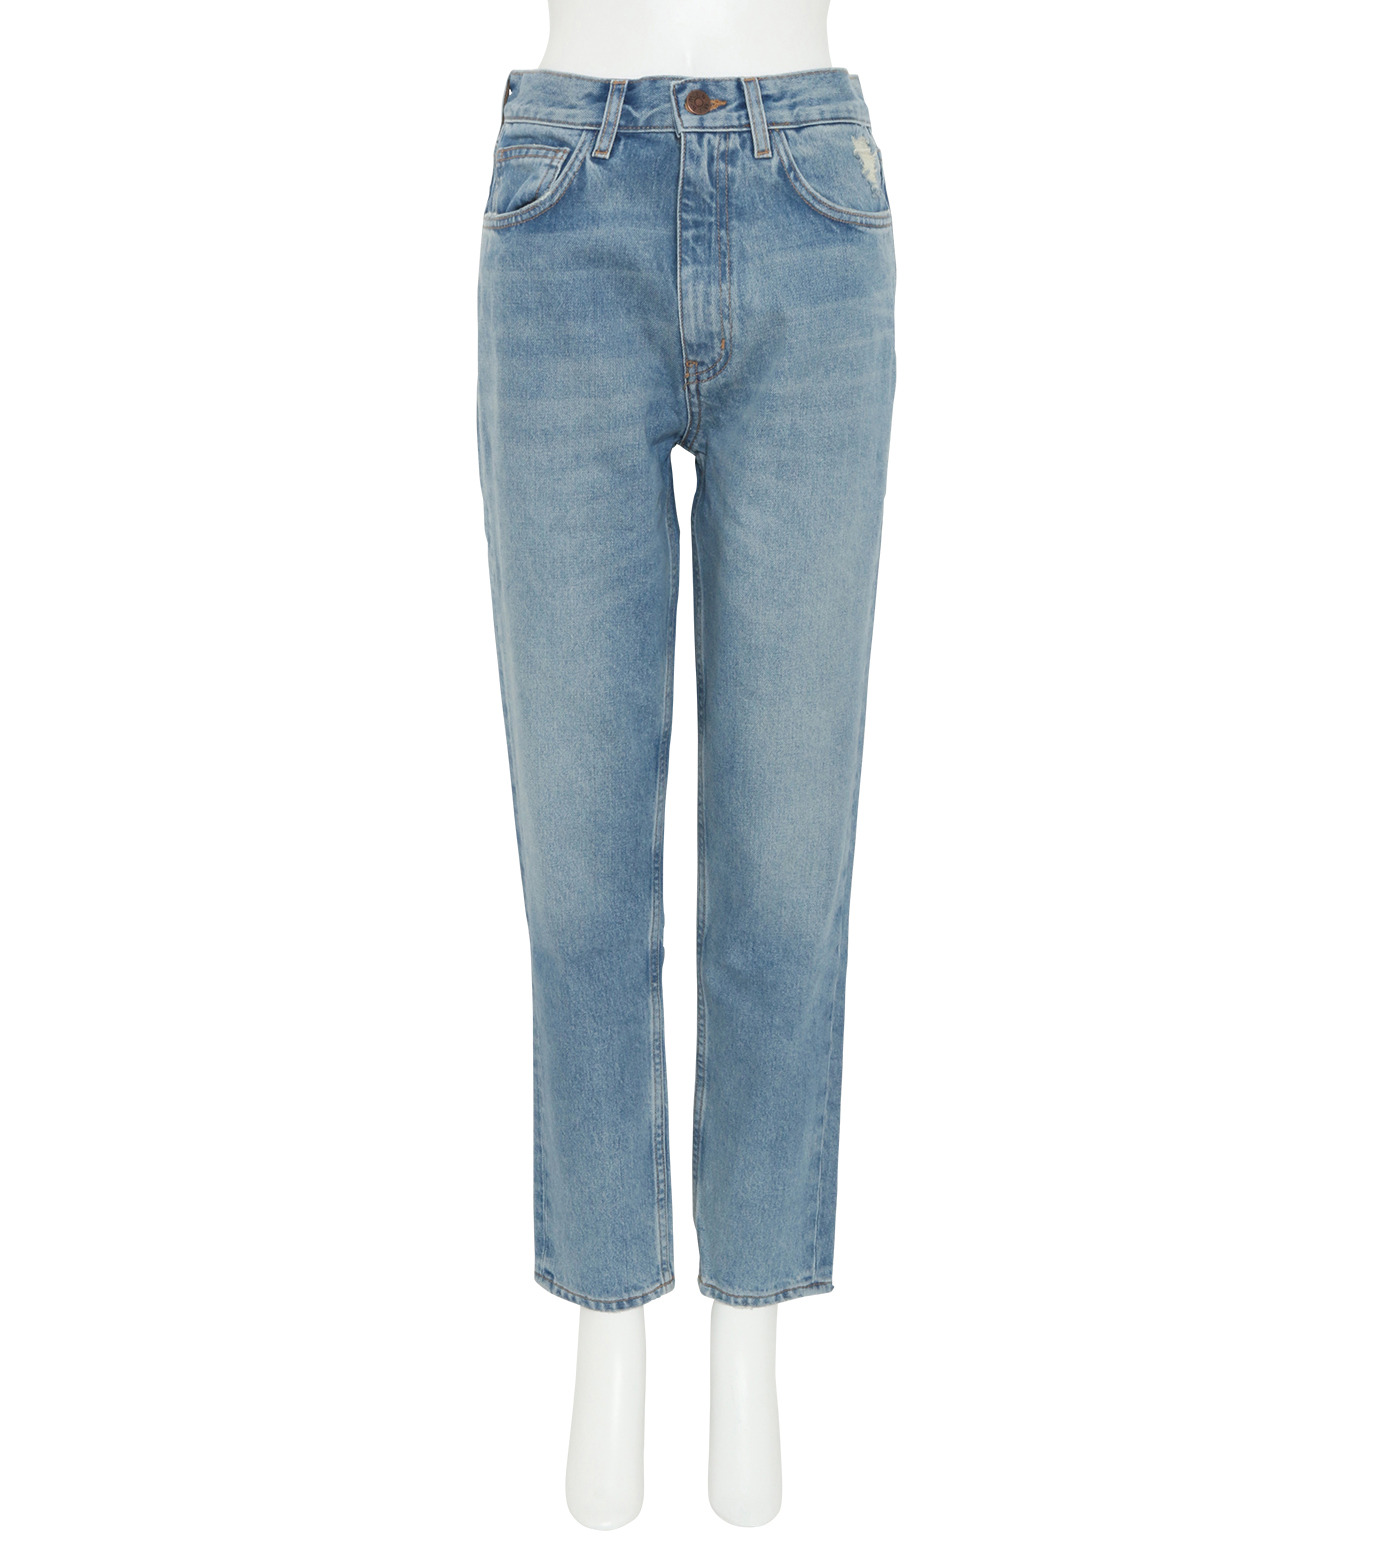 M.i.h Jeans(エムアイエイチジーンズ)のMimi Boyfriend-LIGHT BLUE(デニム/denim)-W2200101-91 拡大詳細画像1